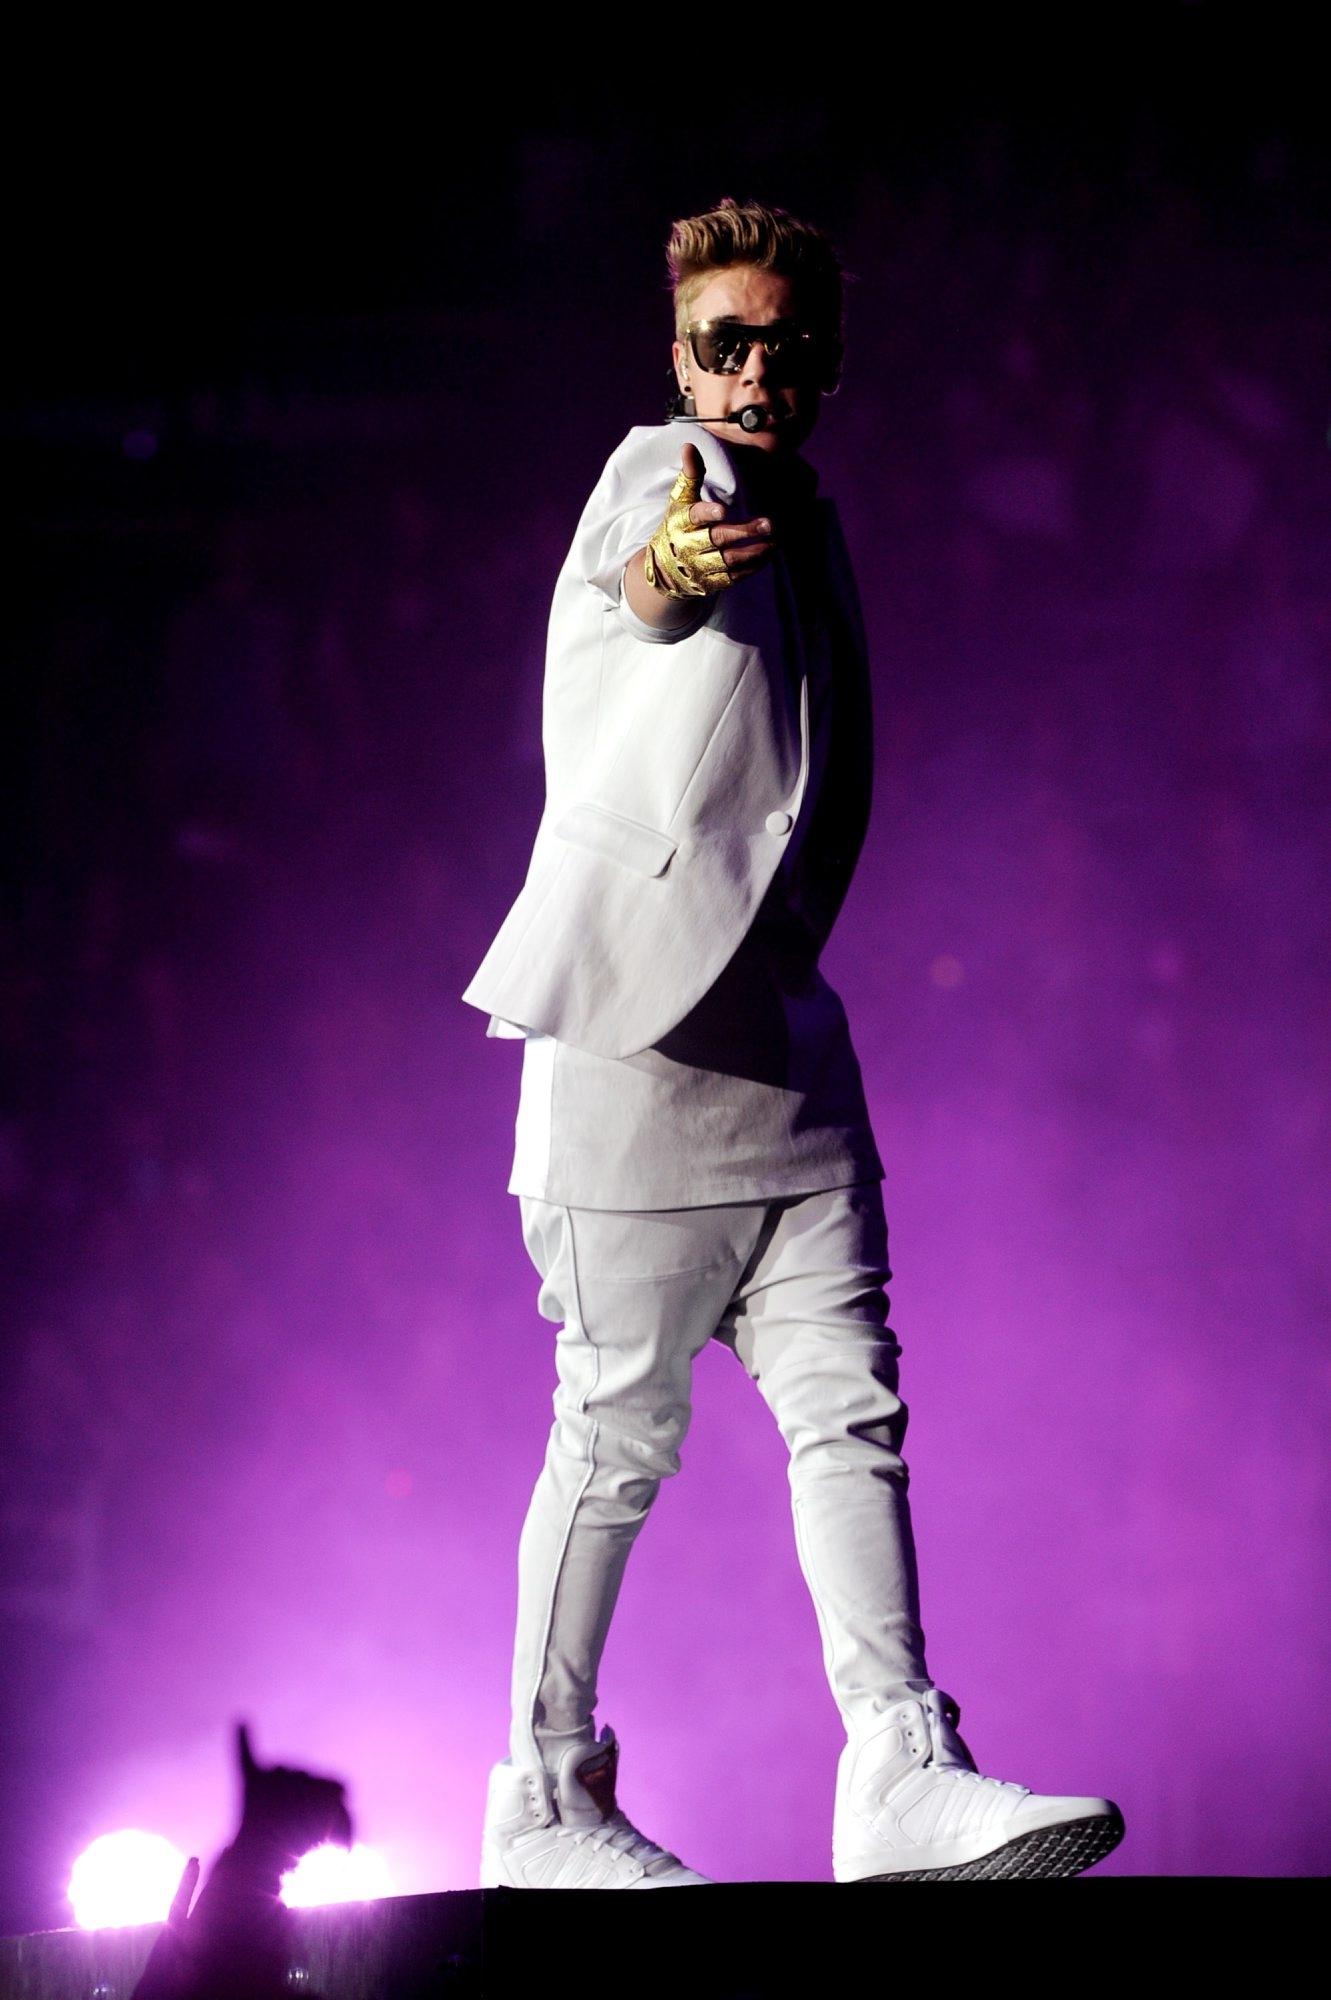 Singer Justin Bieber is playing First Niagara Center tonight.